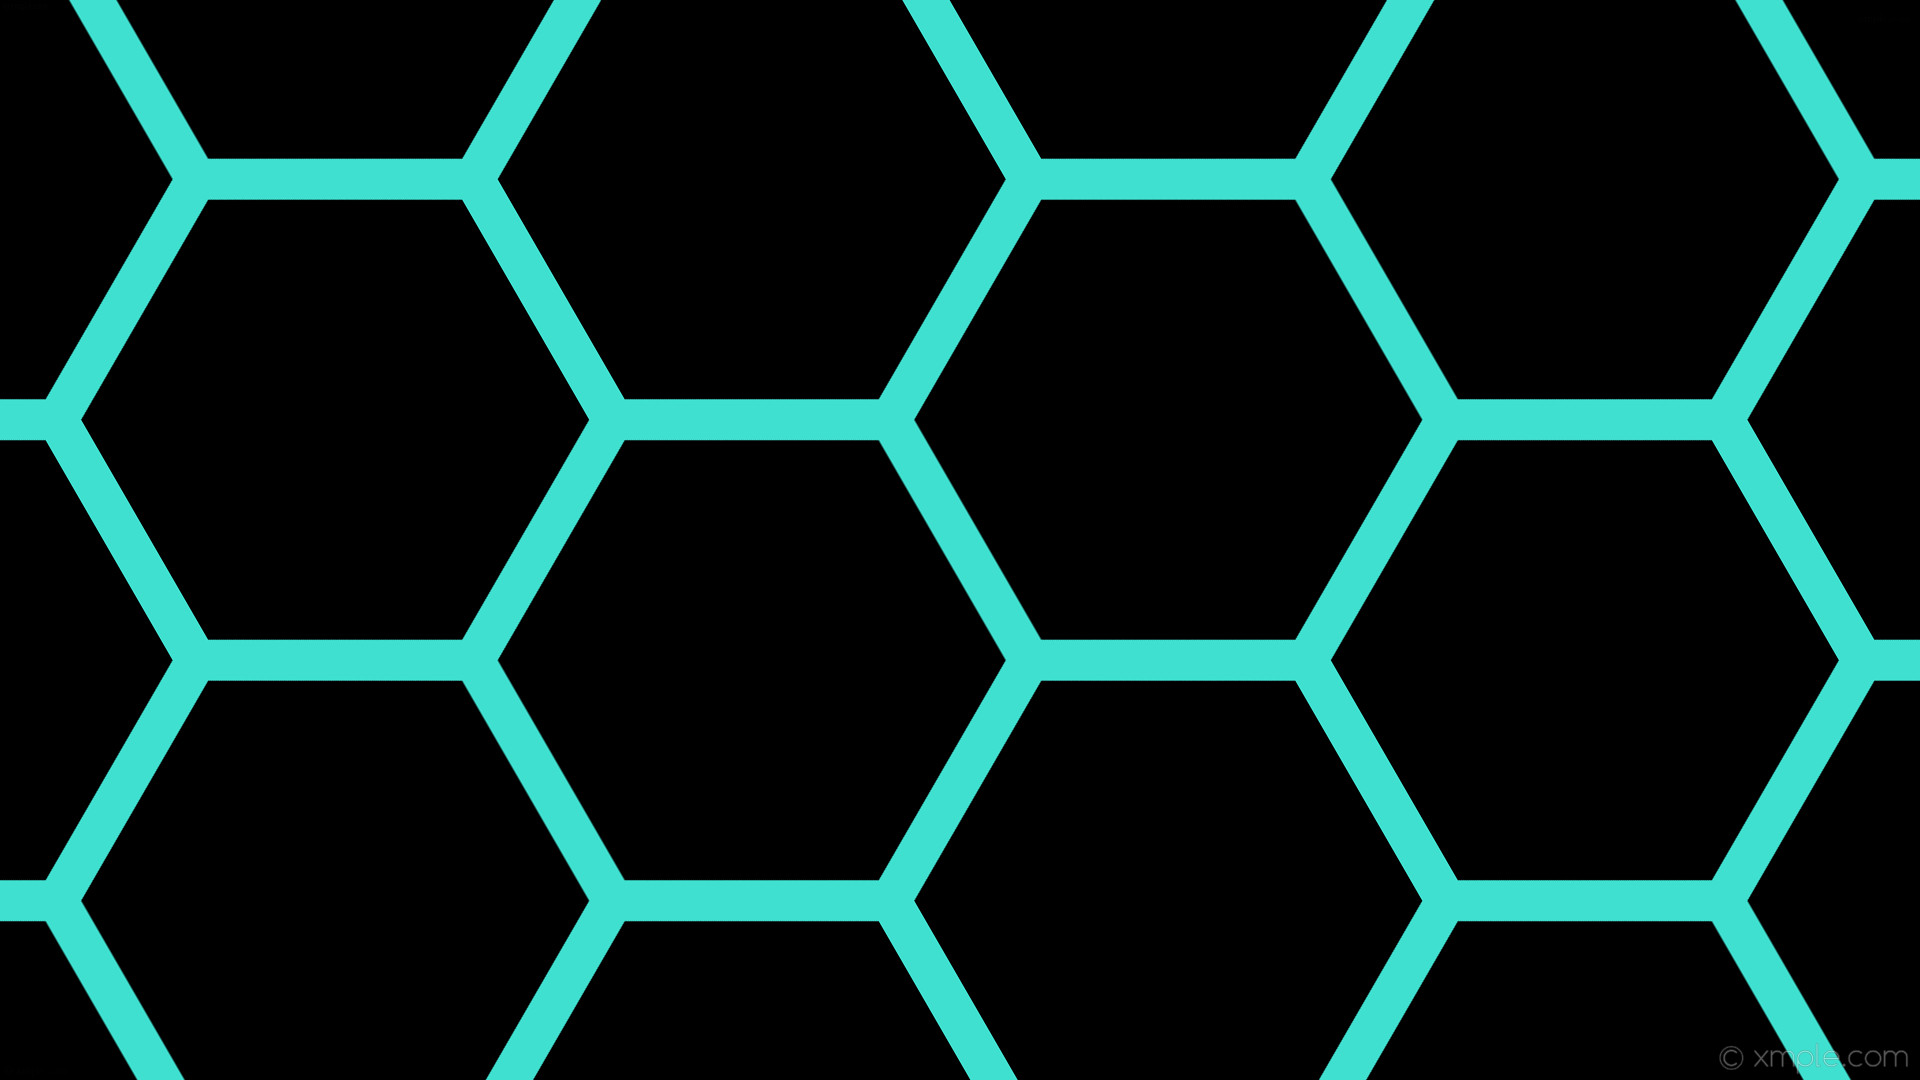 wallpaper beehive black honeycomb hexagon blue turquoise #000000 #40e0d0  diagonal 30° 41px 481px